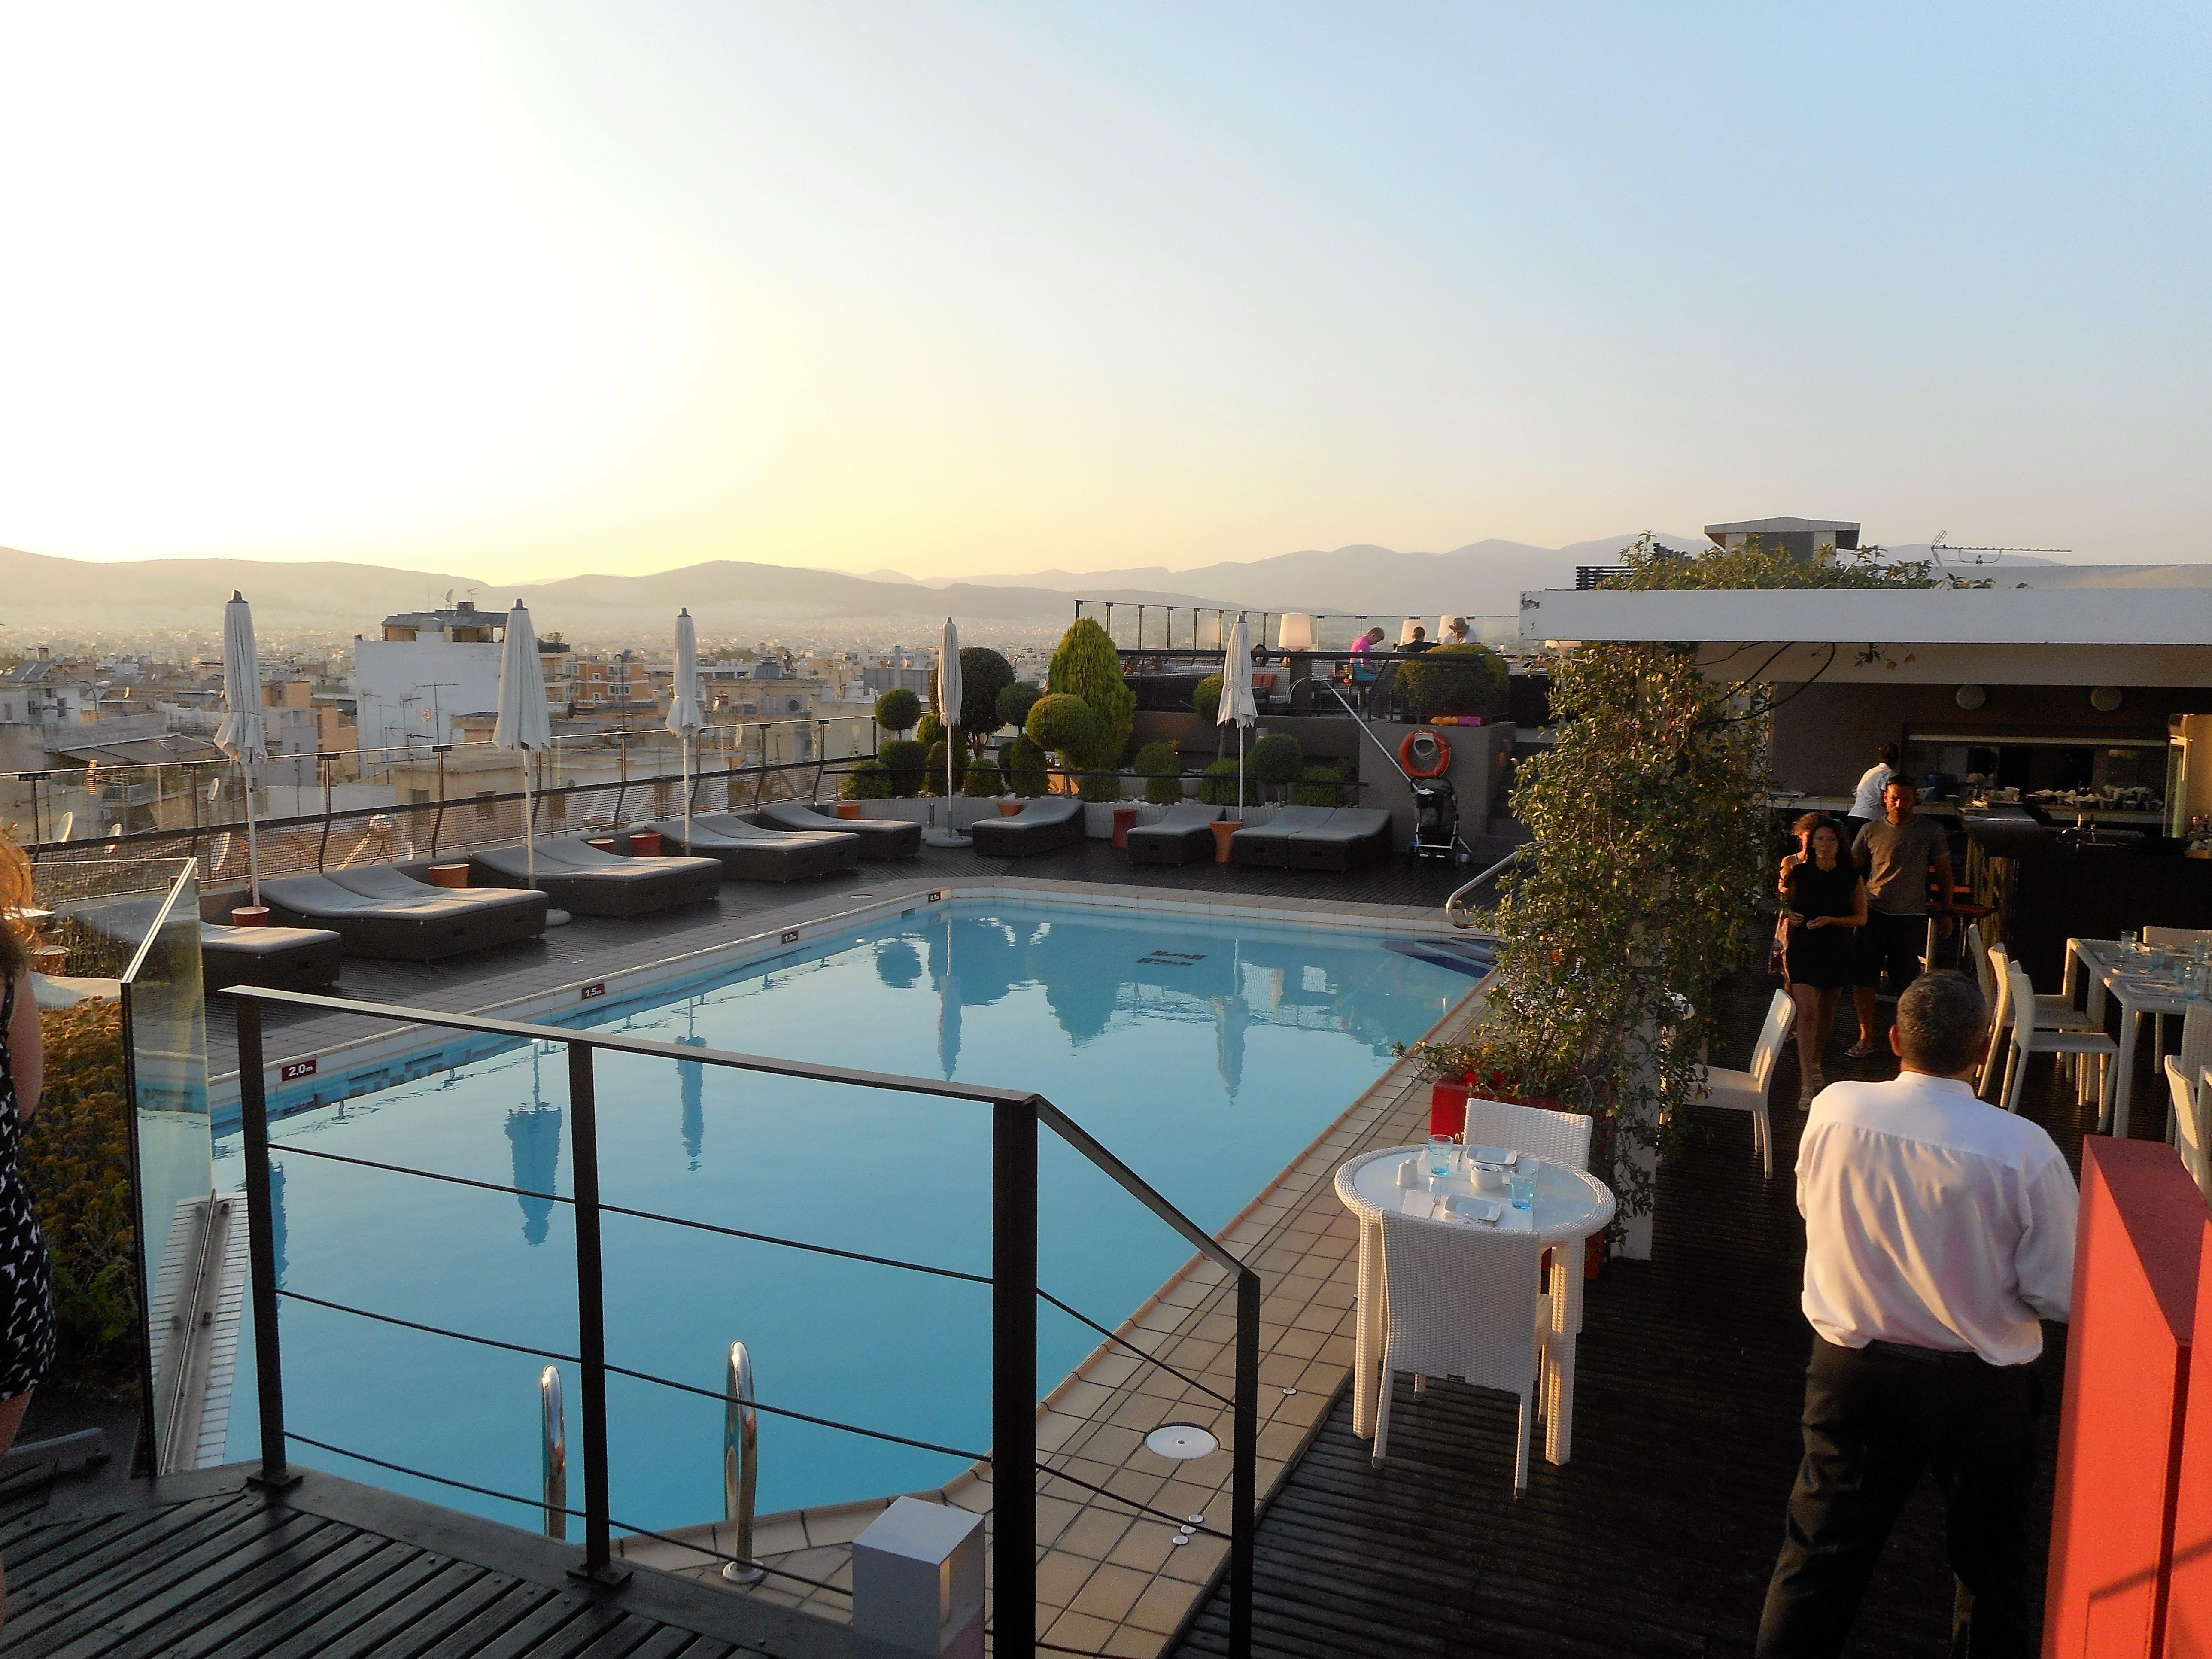 Novotel Athene (hotelreview)